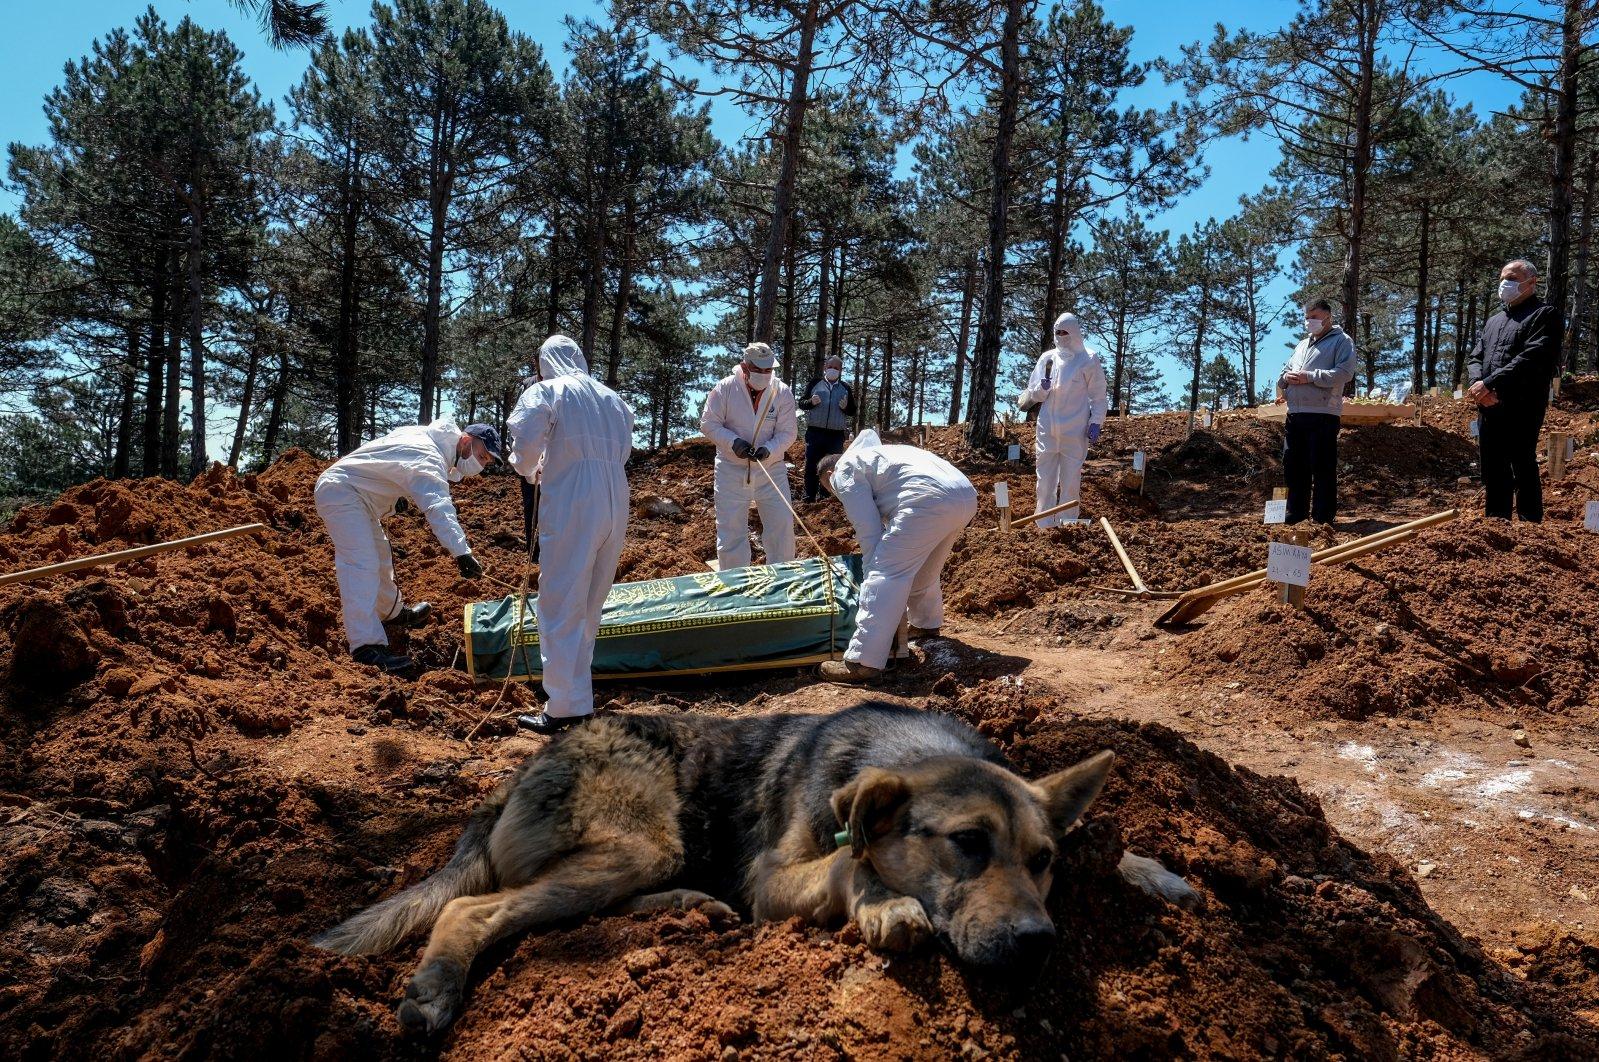 People bury a COVID-19 patient at a cemetery in Çekmeköy district, in Istanbul, Turkey, Dec. 18, 2020. (PHOTO BY UĞUR YILDIRIM)